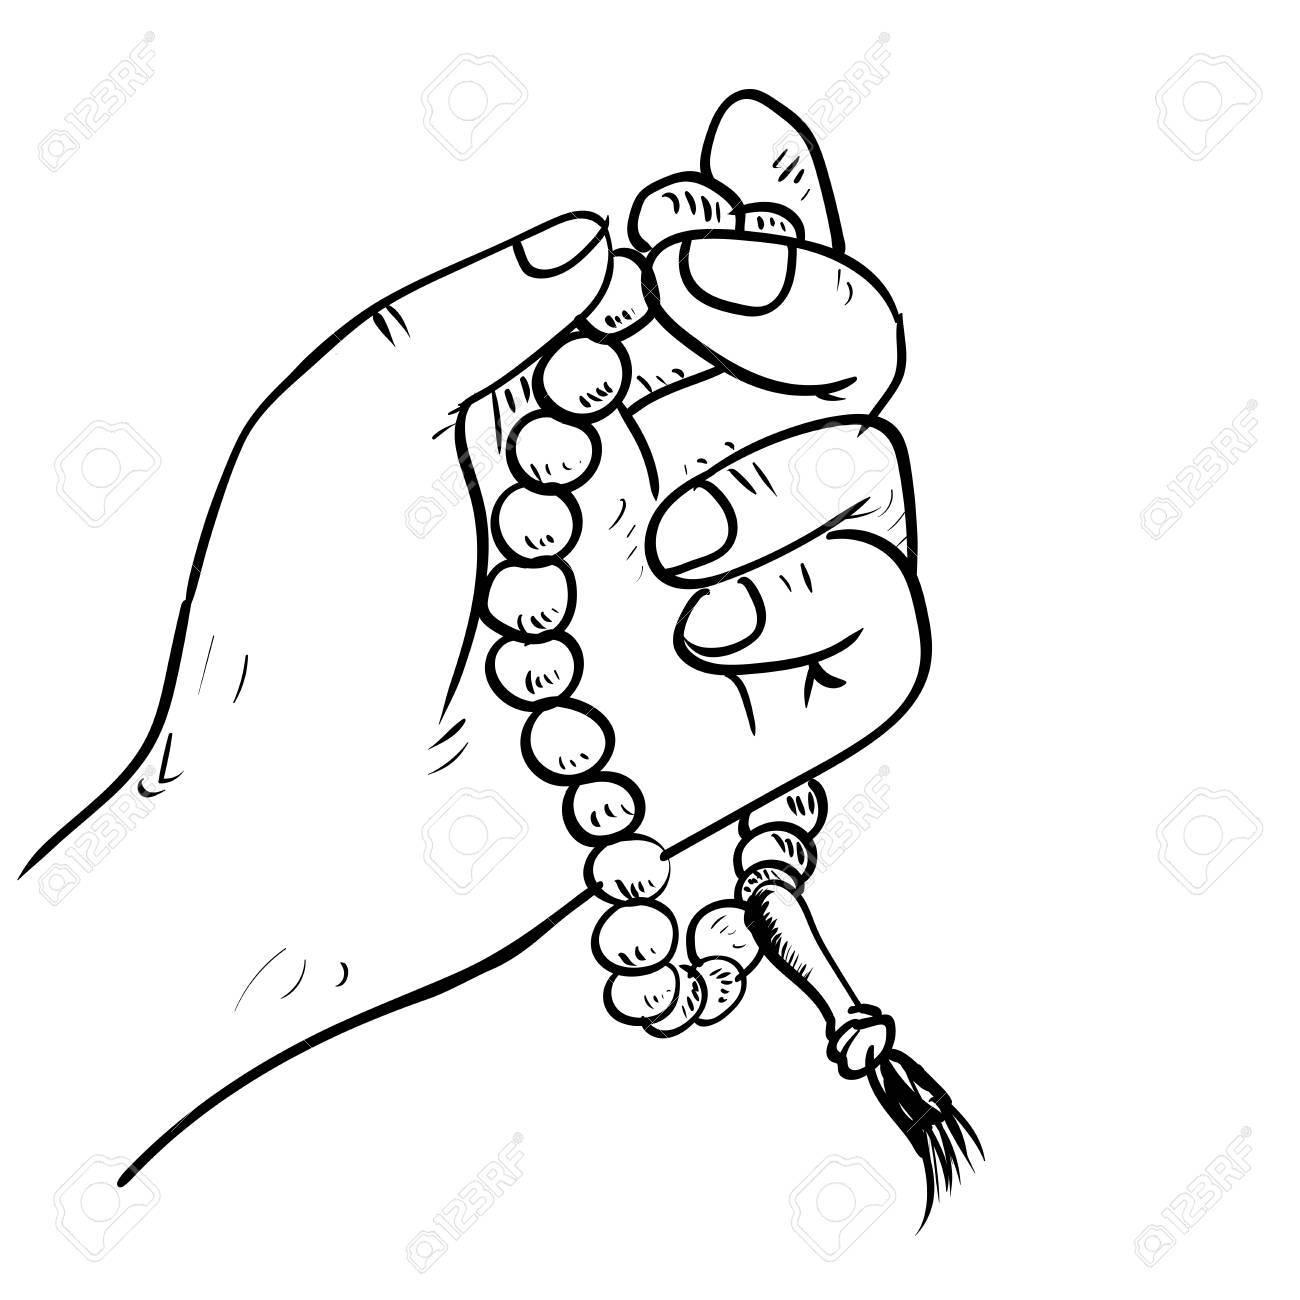 1300x1300 Hand Drawn Hand Holding Islamic Prayer Beads In Cartoon Style